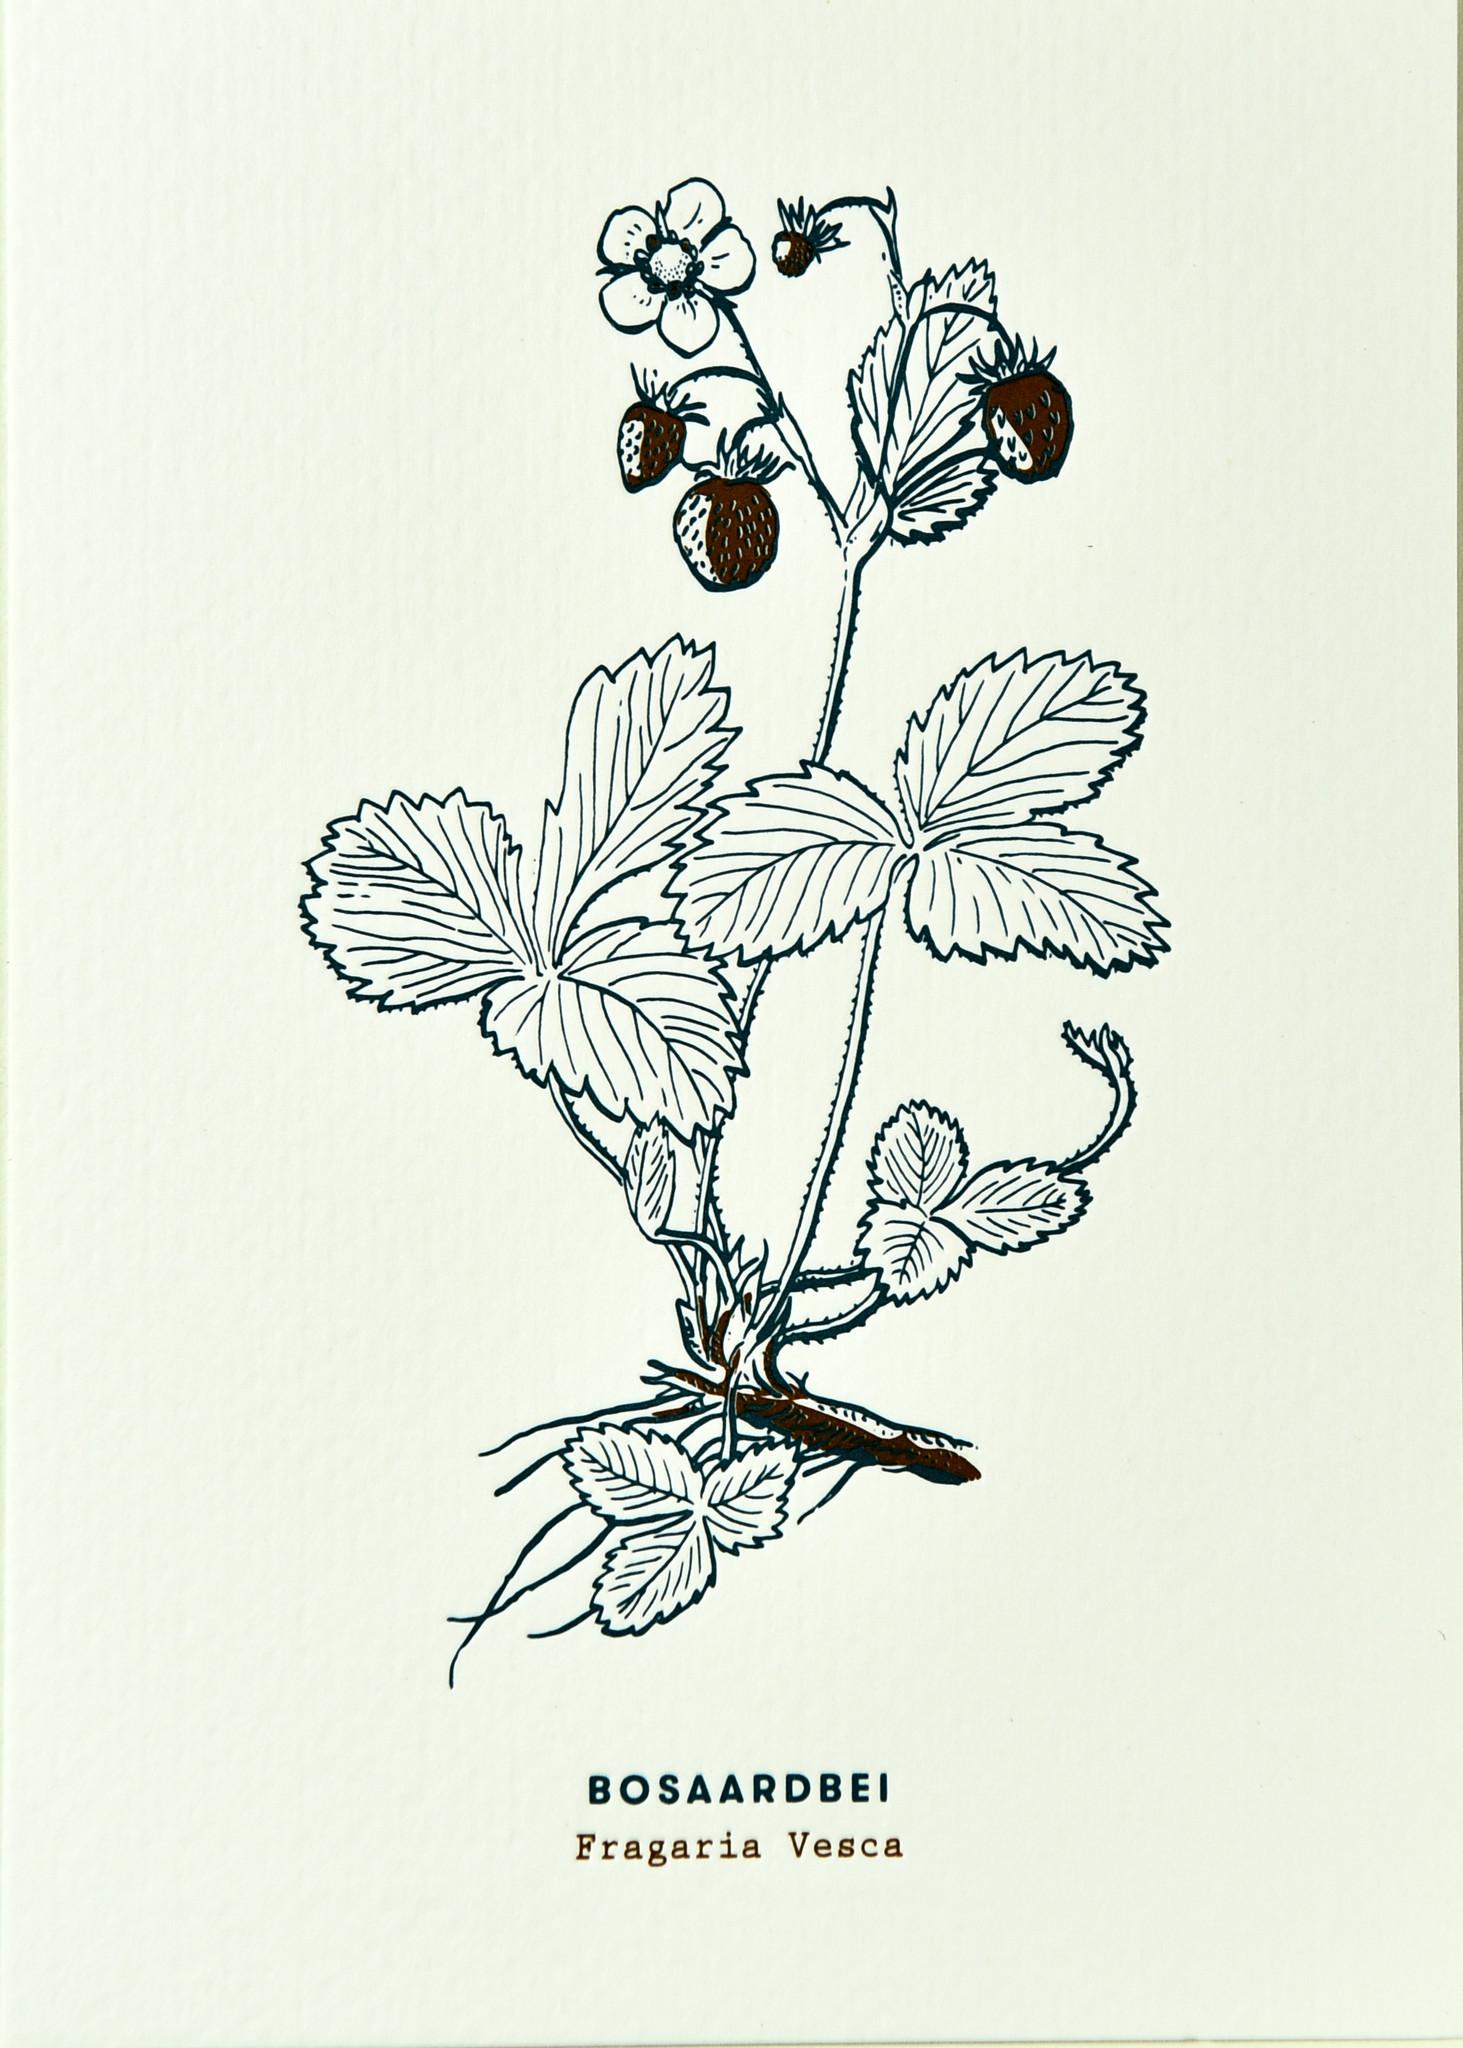 Blommm Luxe postkaart Bosaardbei - Blommm